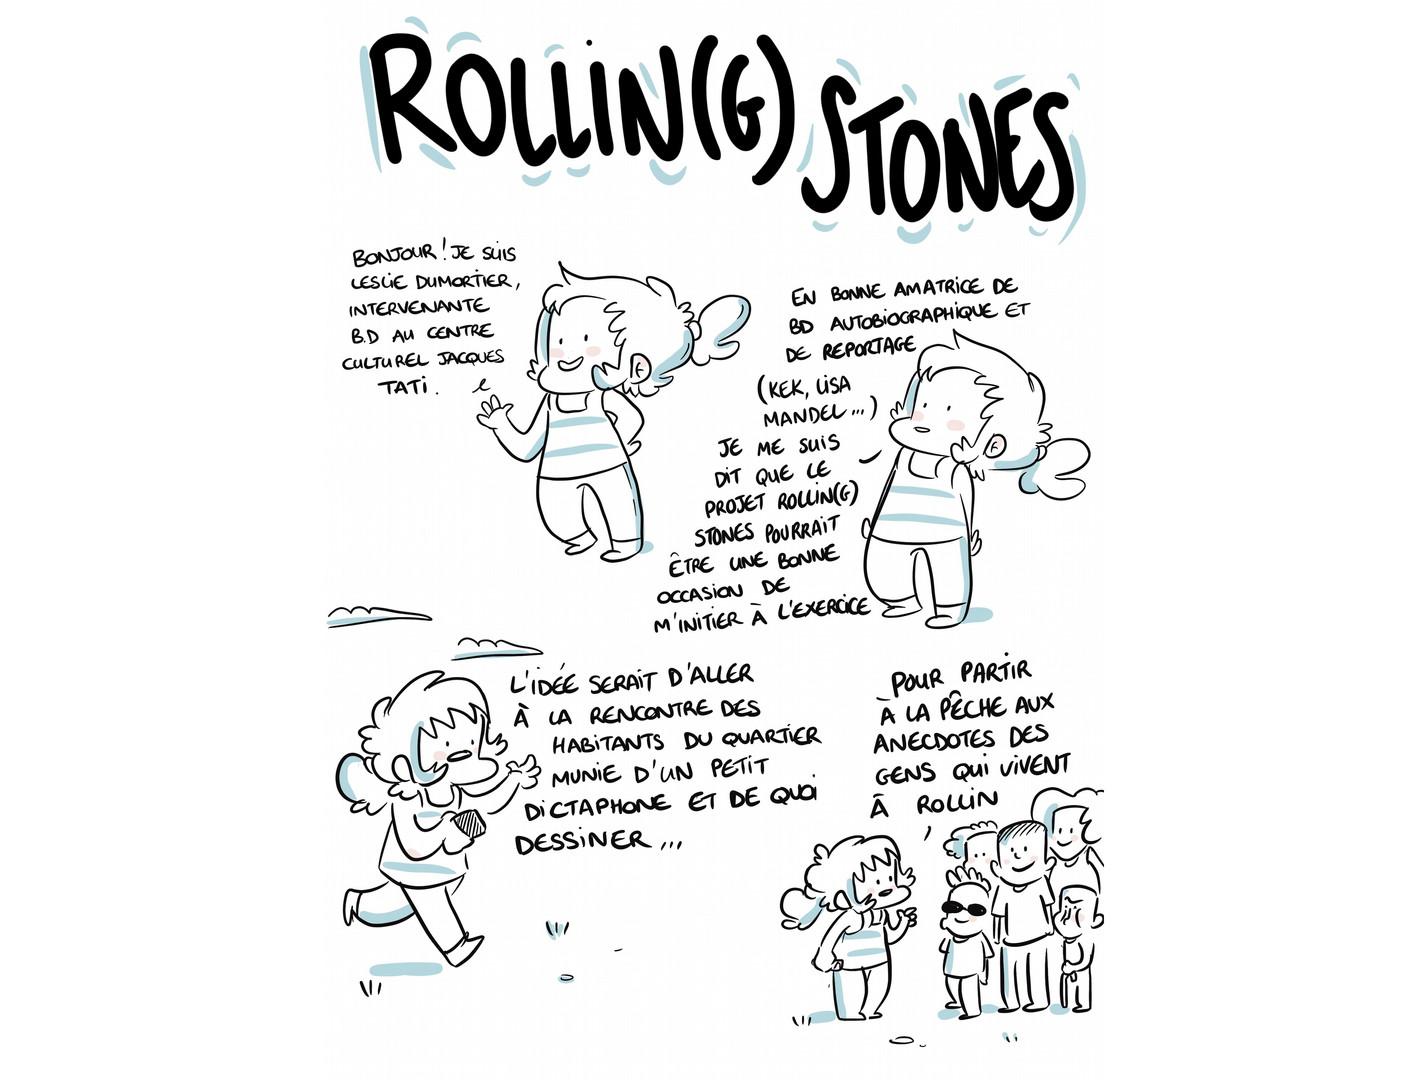 rollinstones-1.jpg